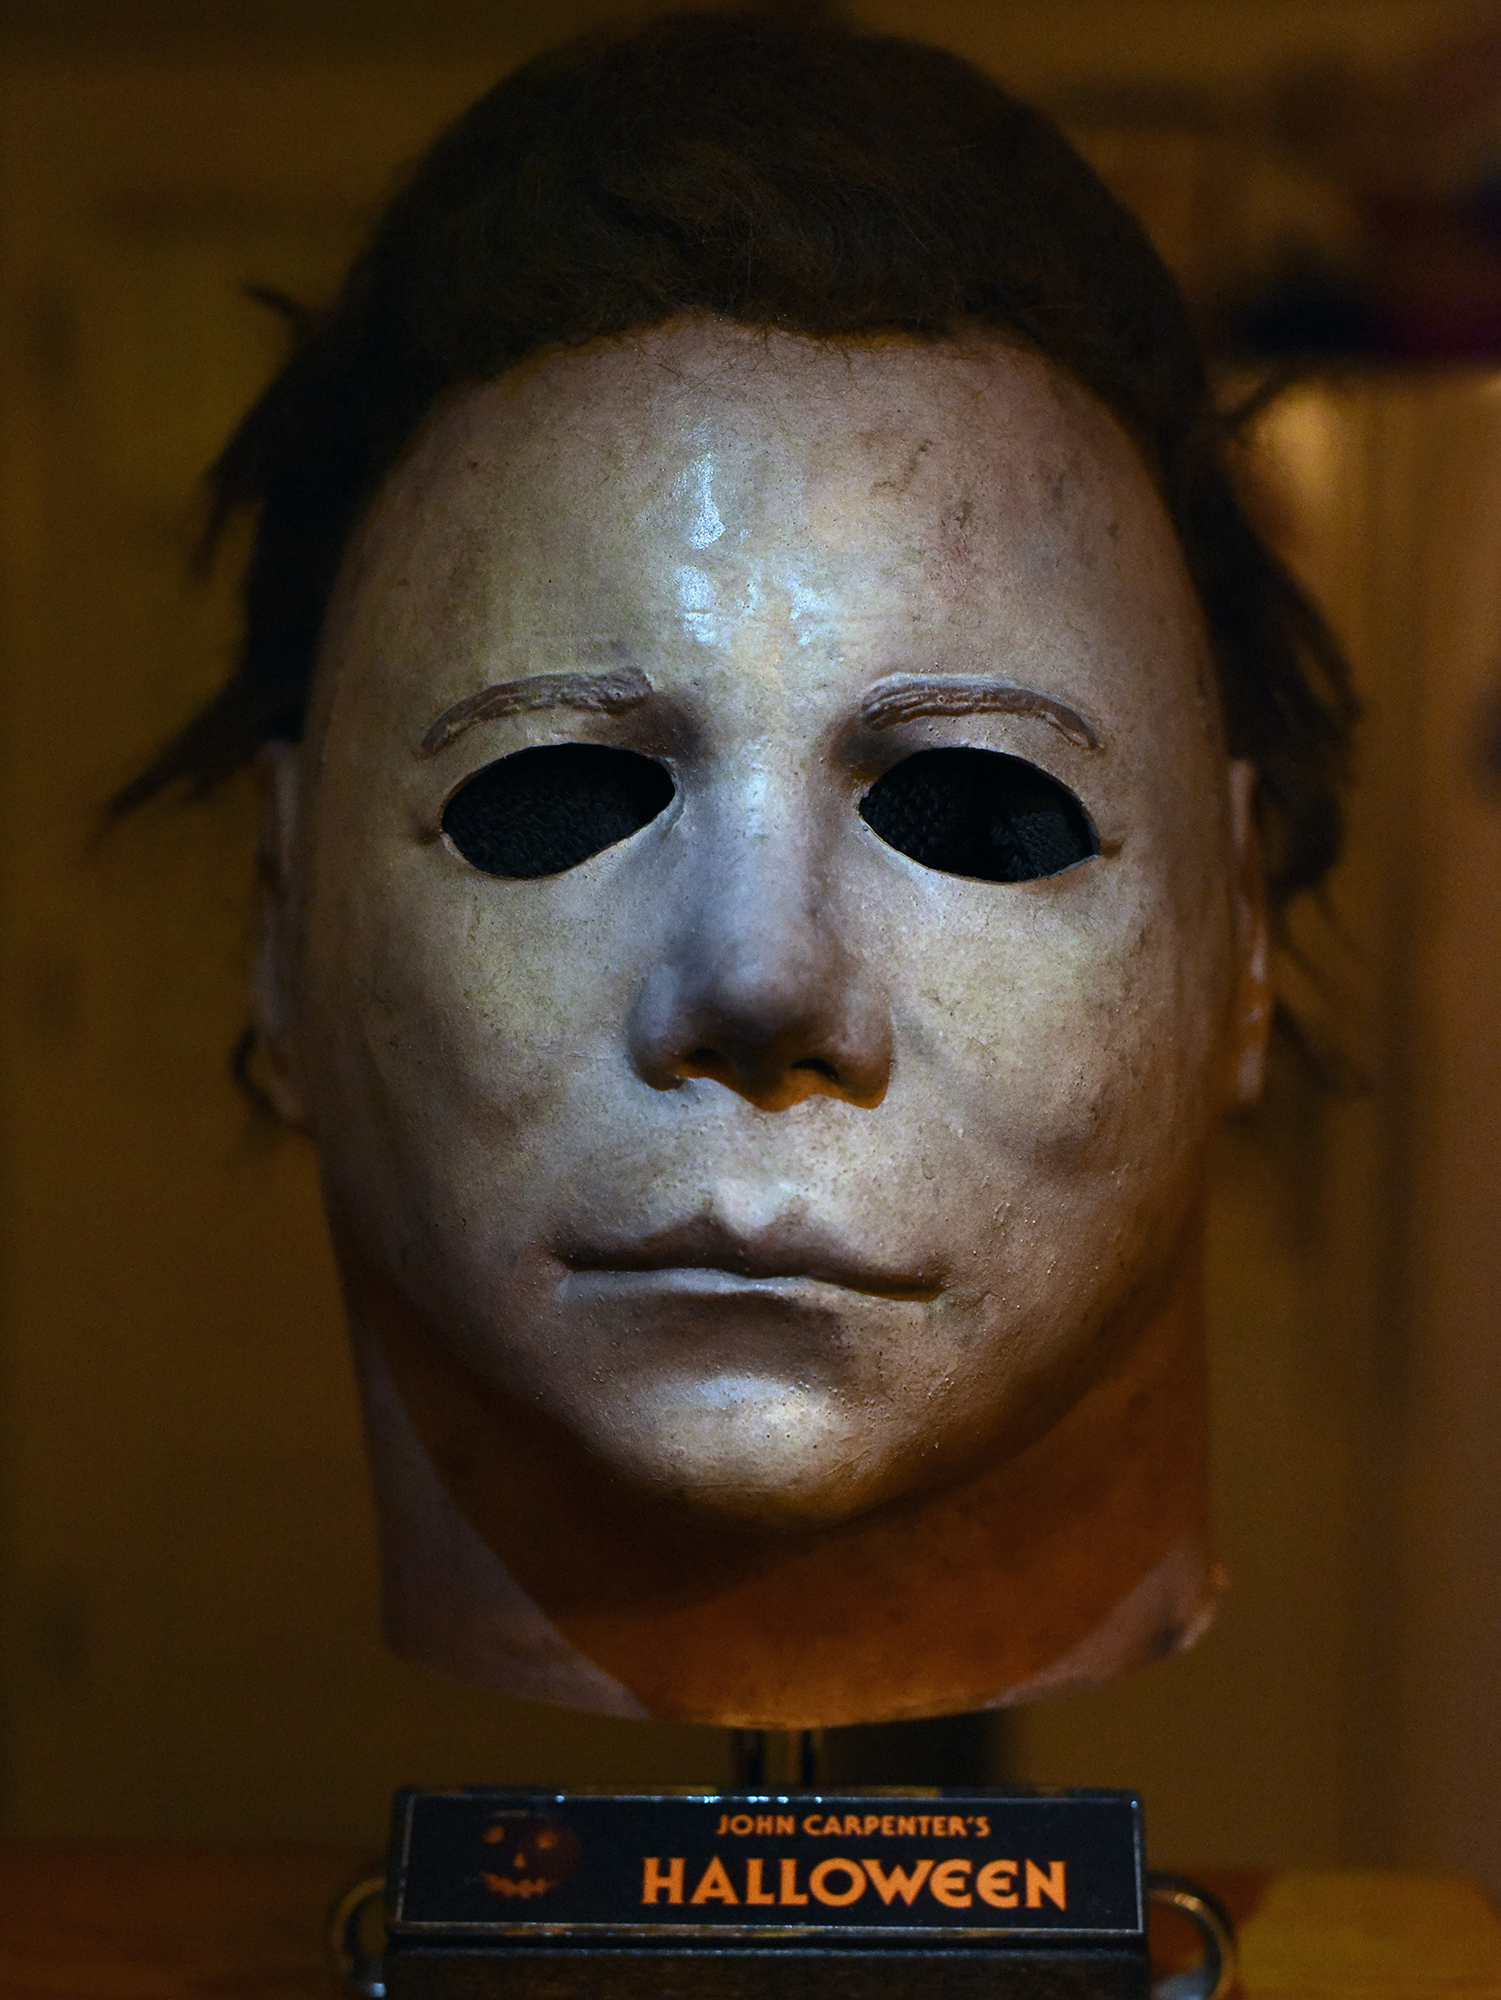 James Carter 2020 Halloween Mask James Carter JC NAG 98 Proto Michael Myers Mask For Sale! — Lord